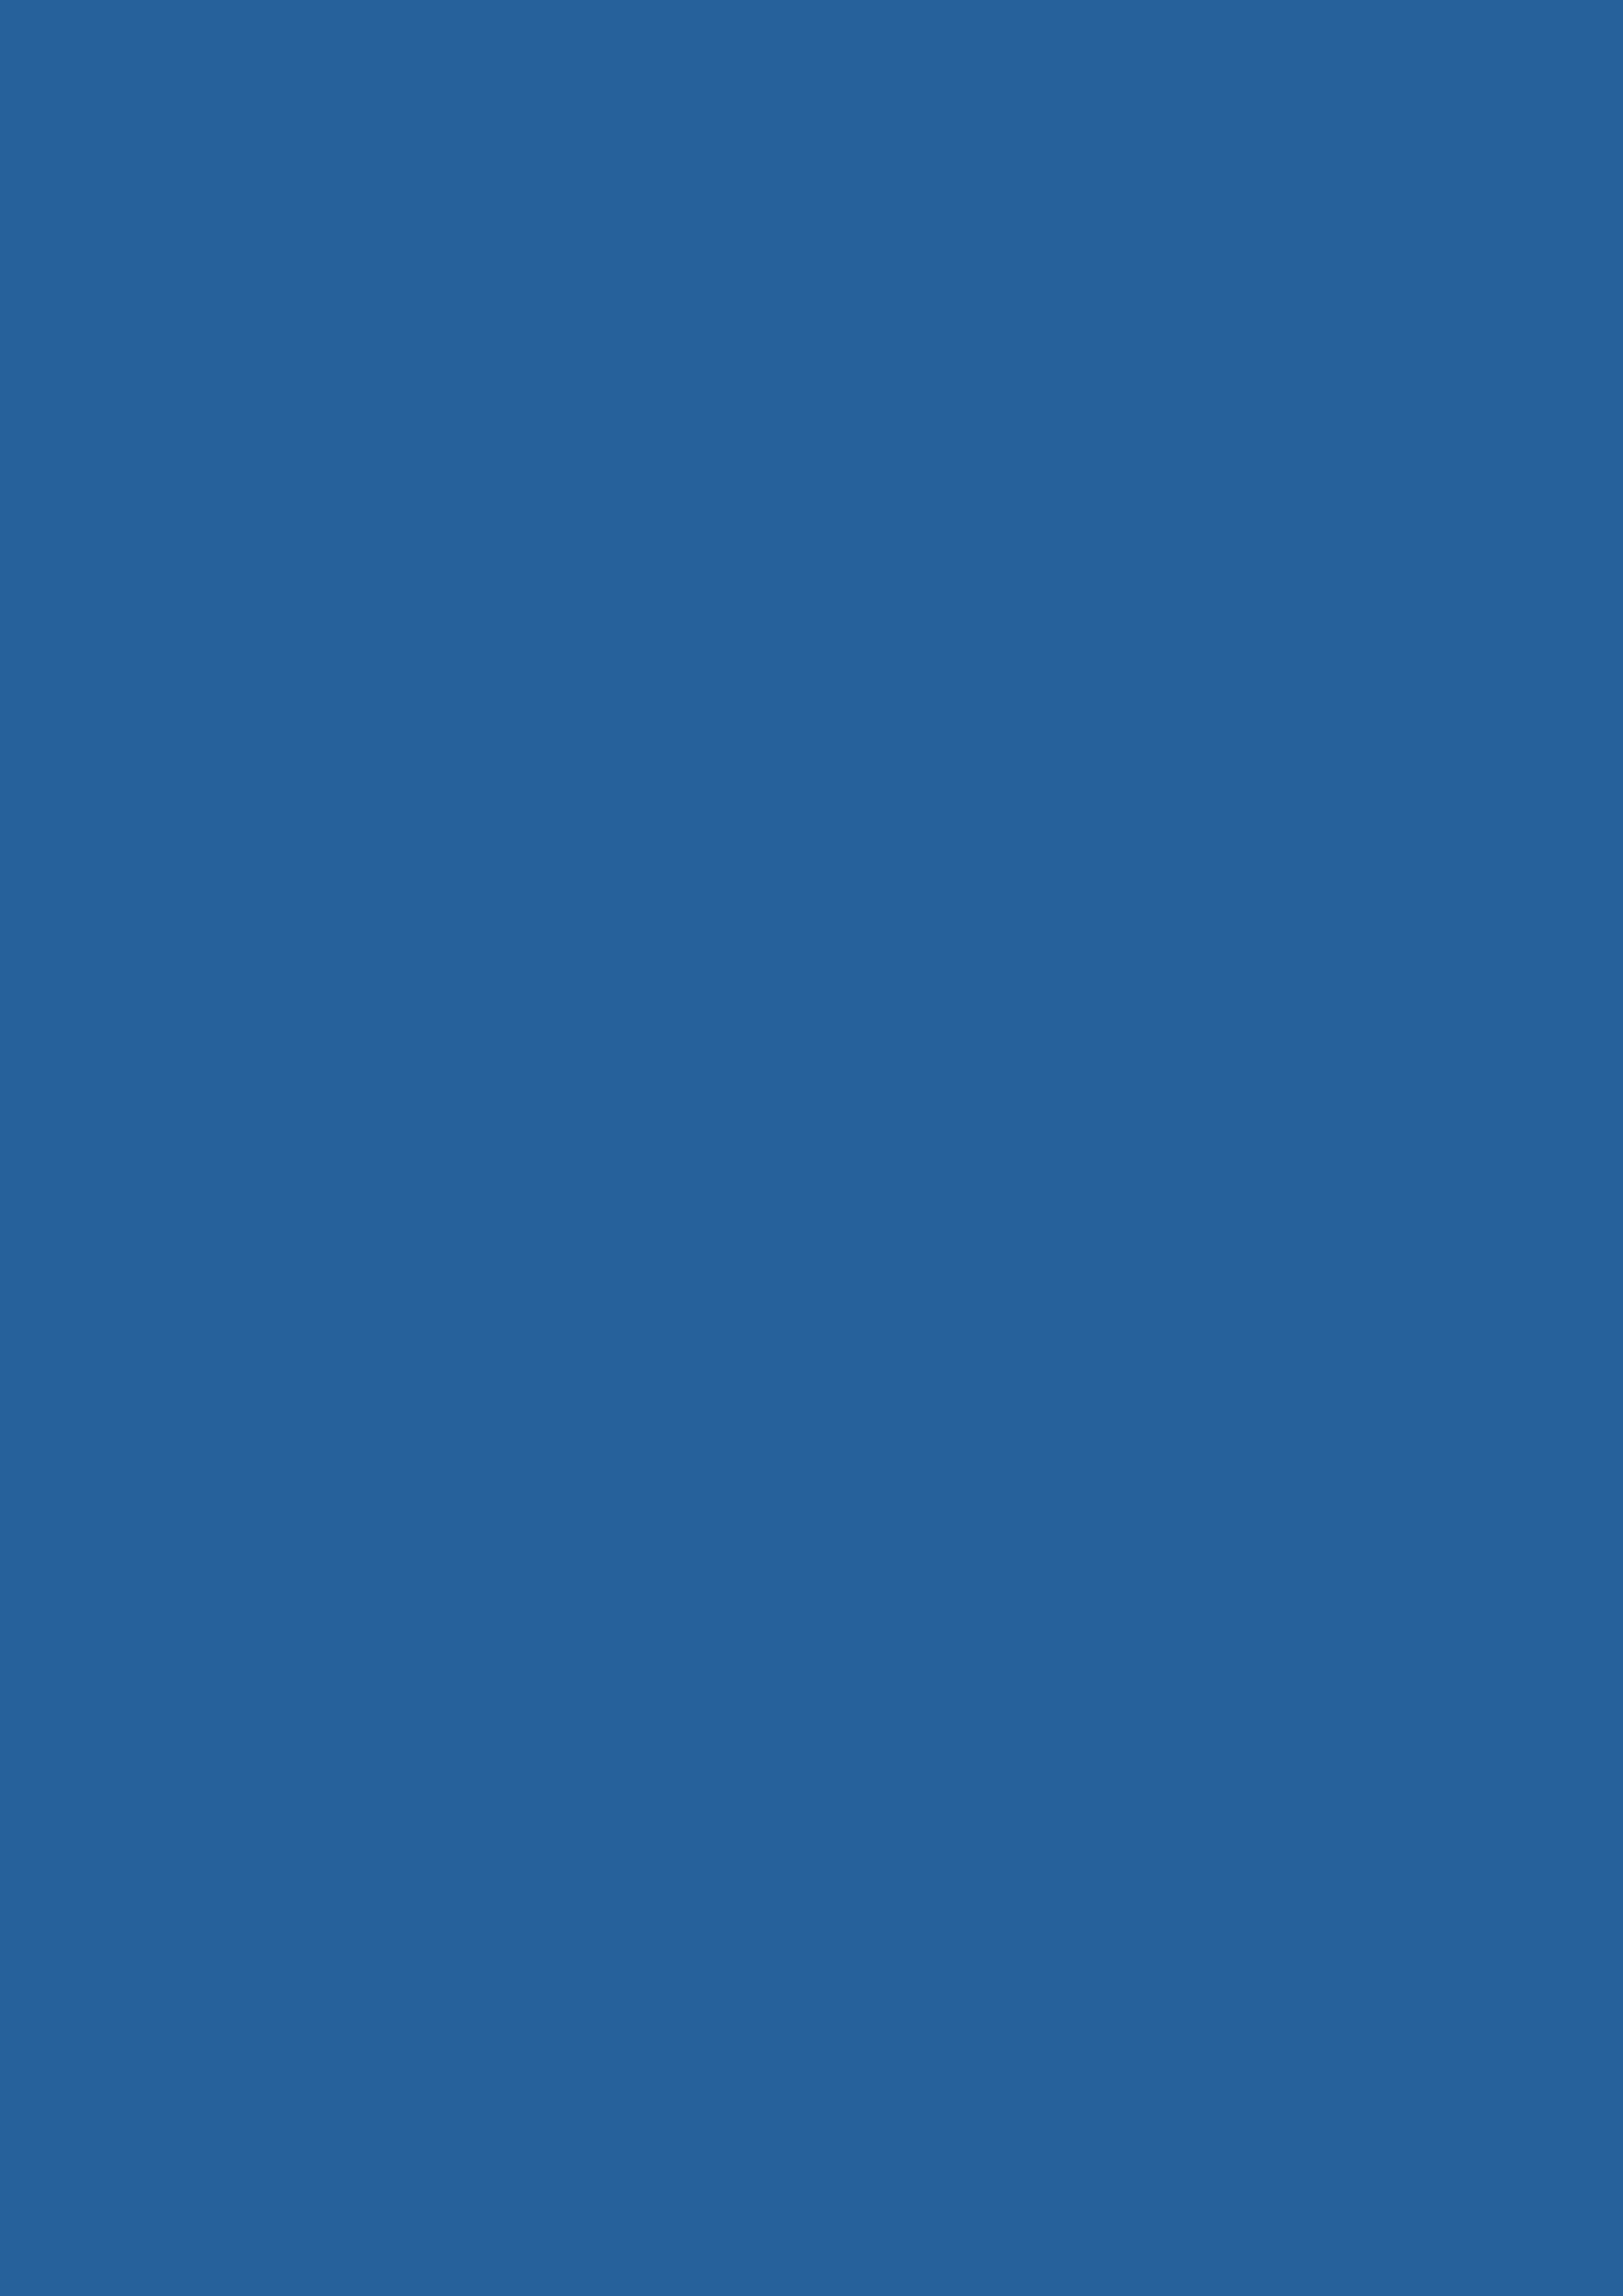 2480x3508 Lapis Lazuli Solid Color Background